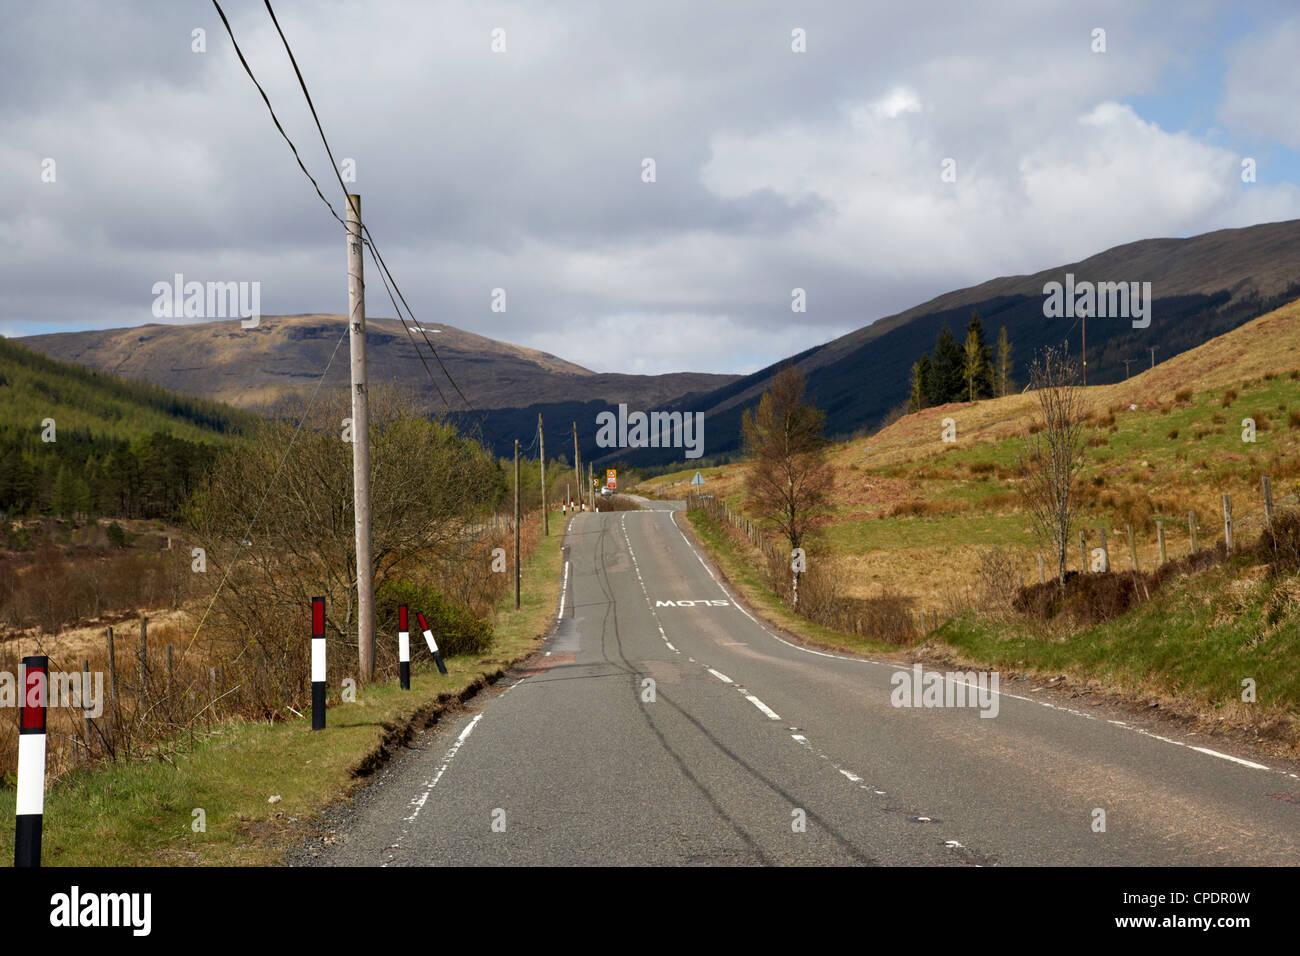 a82 trunk road through the scottish highlands Scotland UK - Stock Image